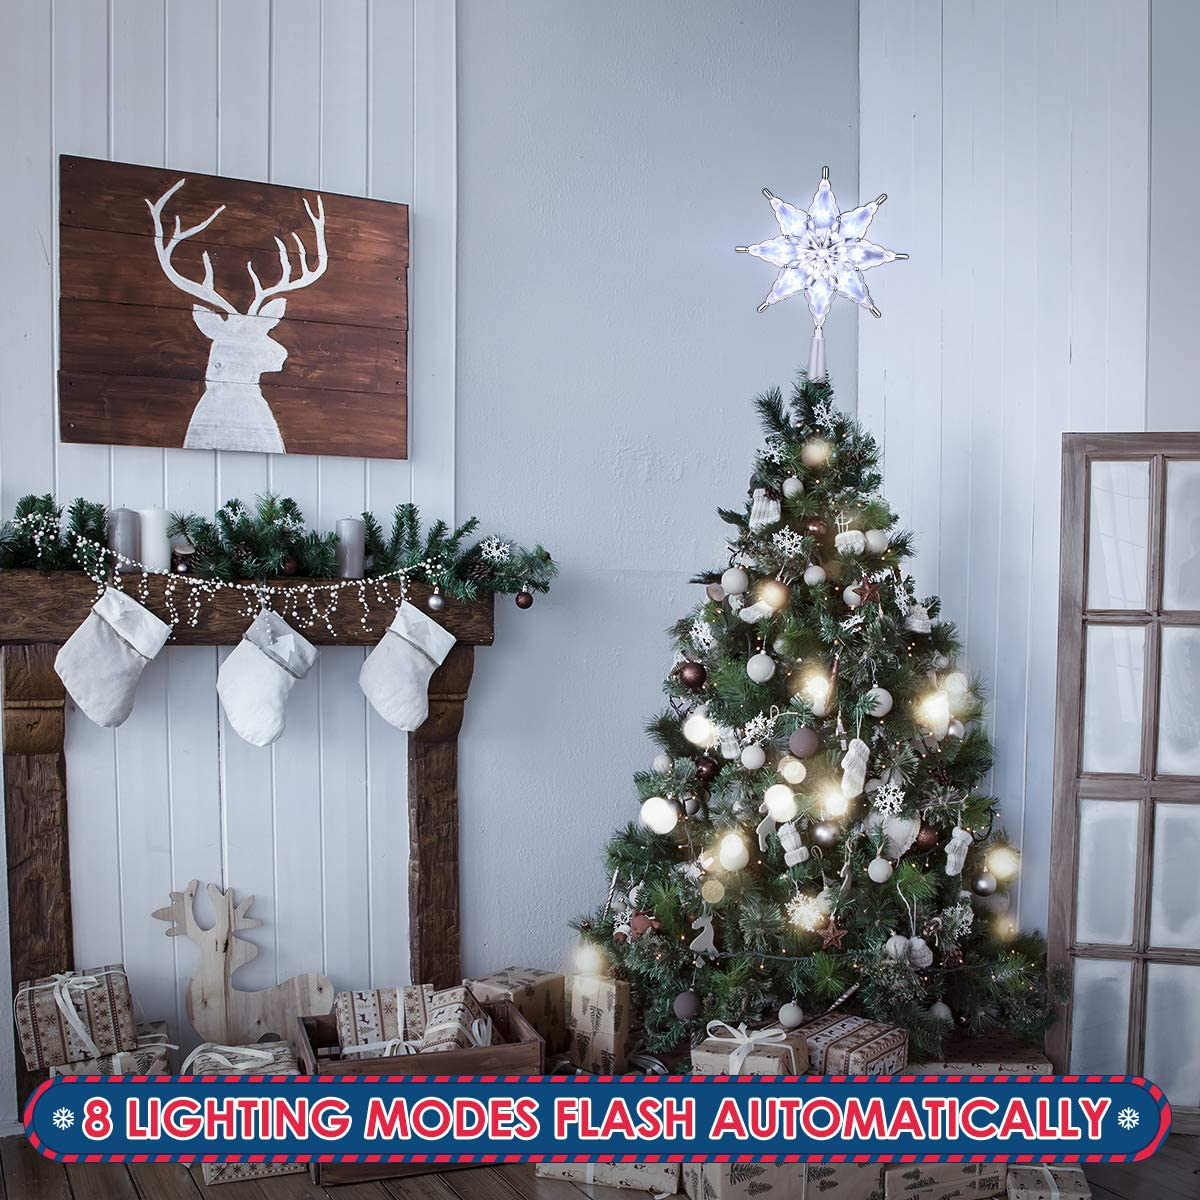 Christmas Treetop Star, Christmas Star Tree Decoration Christmas Silver Tree Ornament for Christmas Decoration